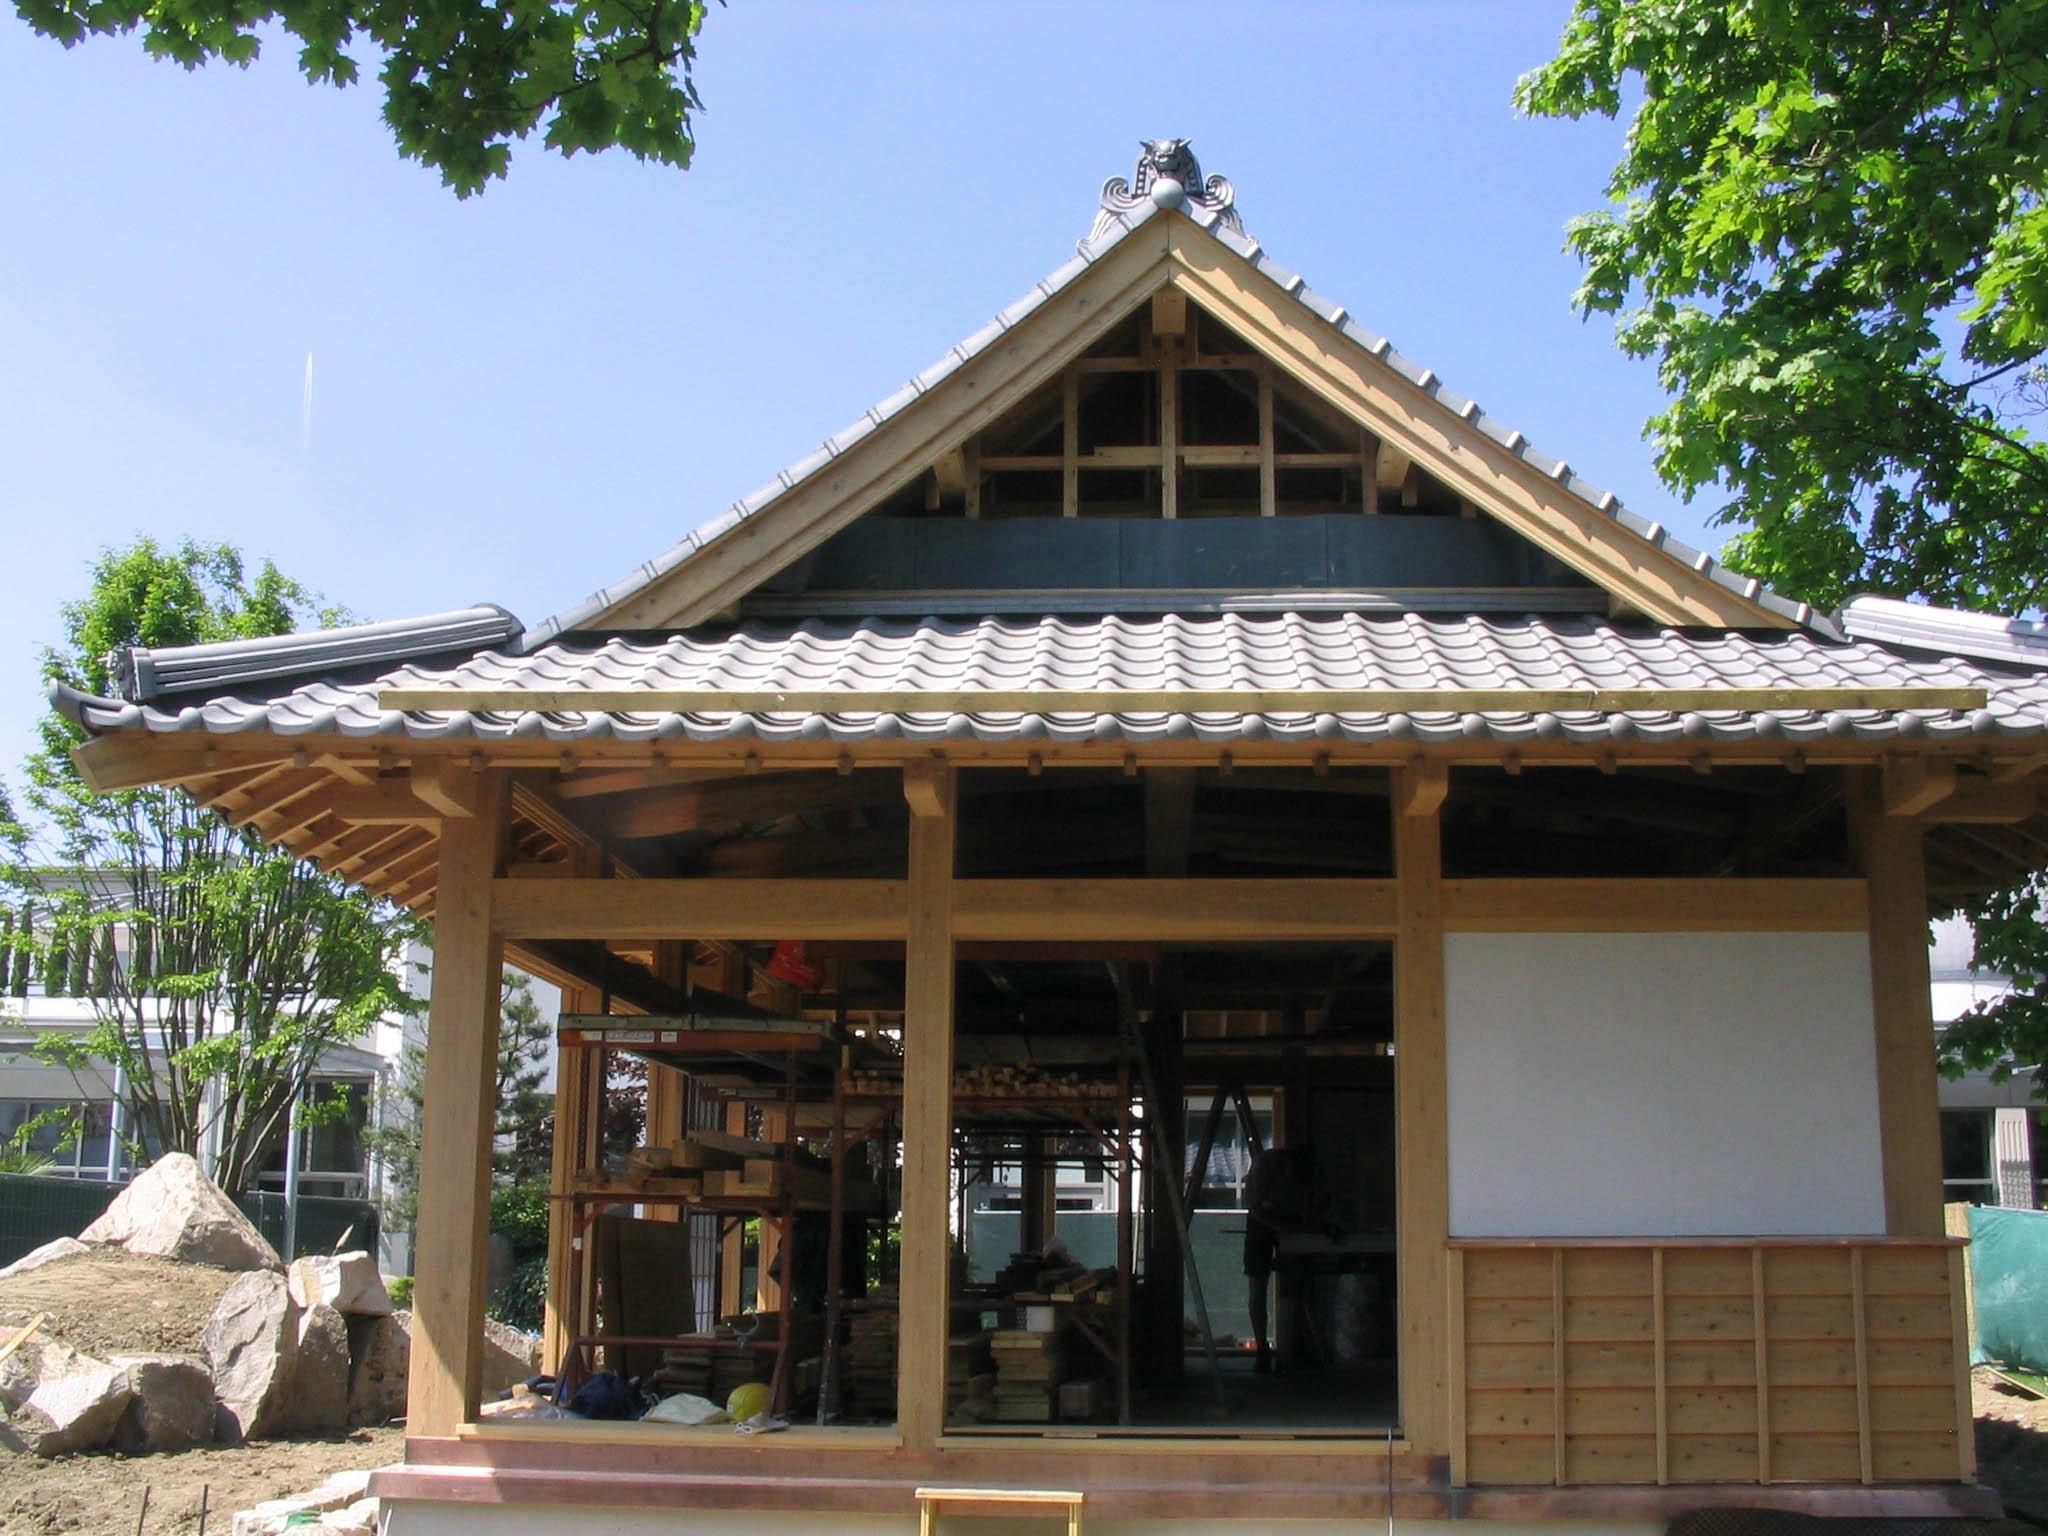 Img - Japanisches Teehaus, Vita Classica Bad Krozingen